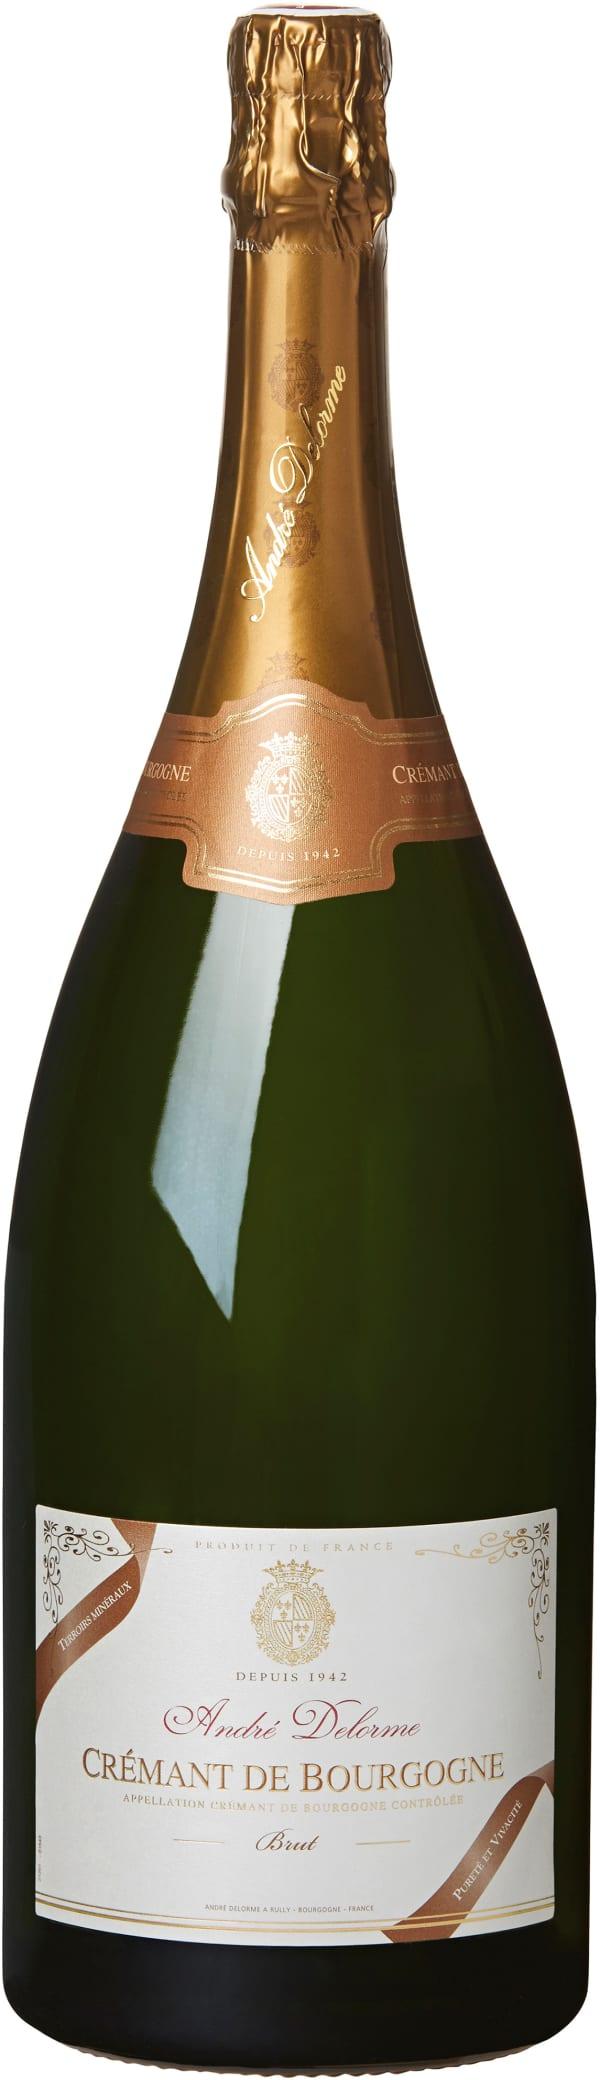 Andre Delorme Crémant de Bourgogne Magnum Brut